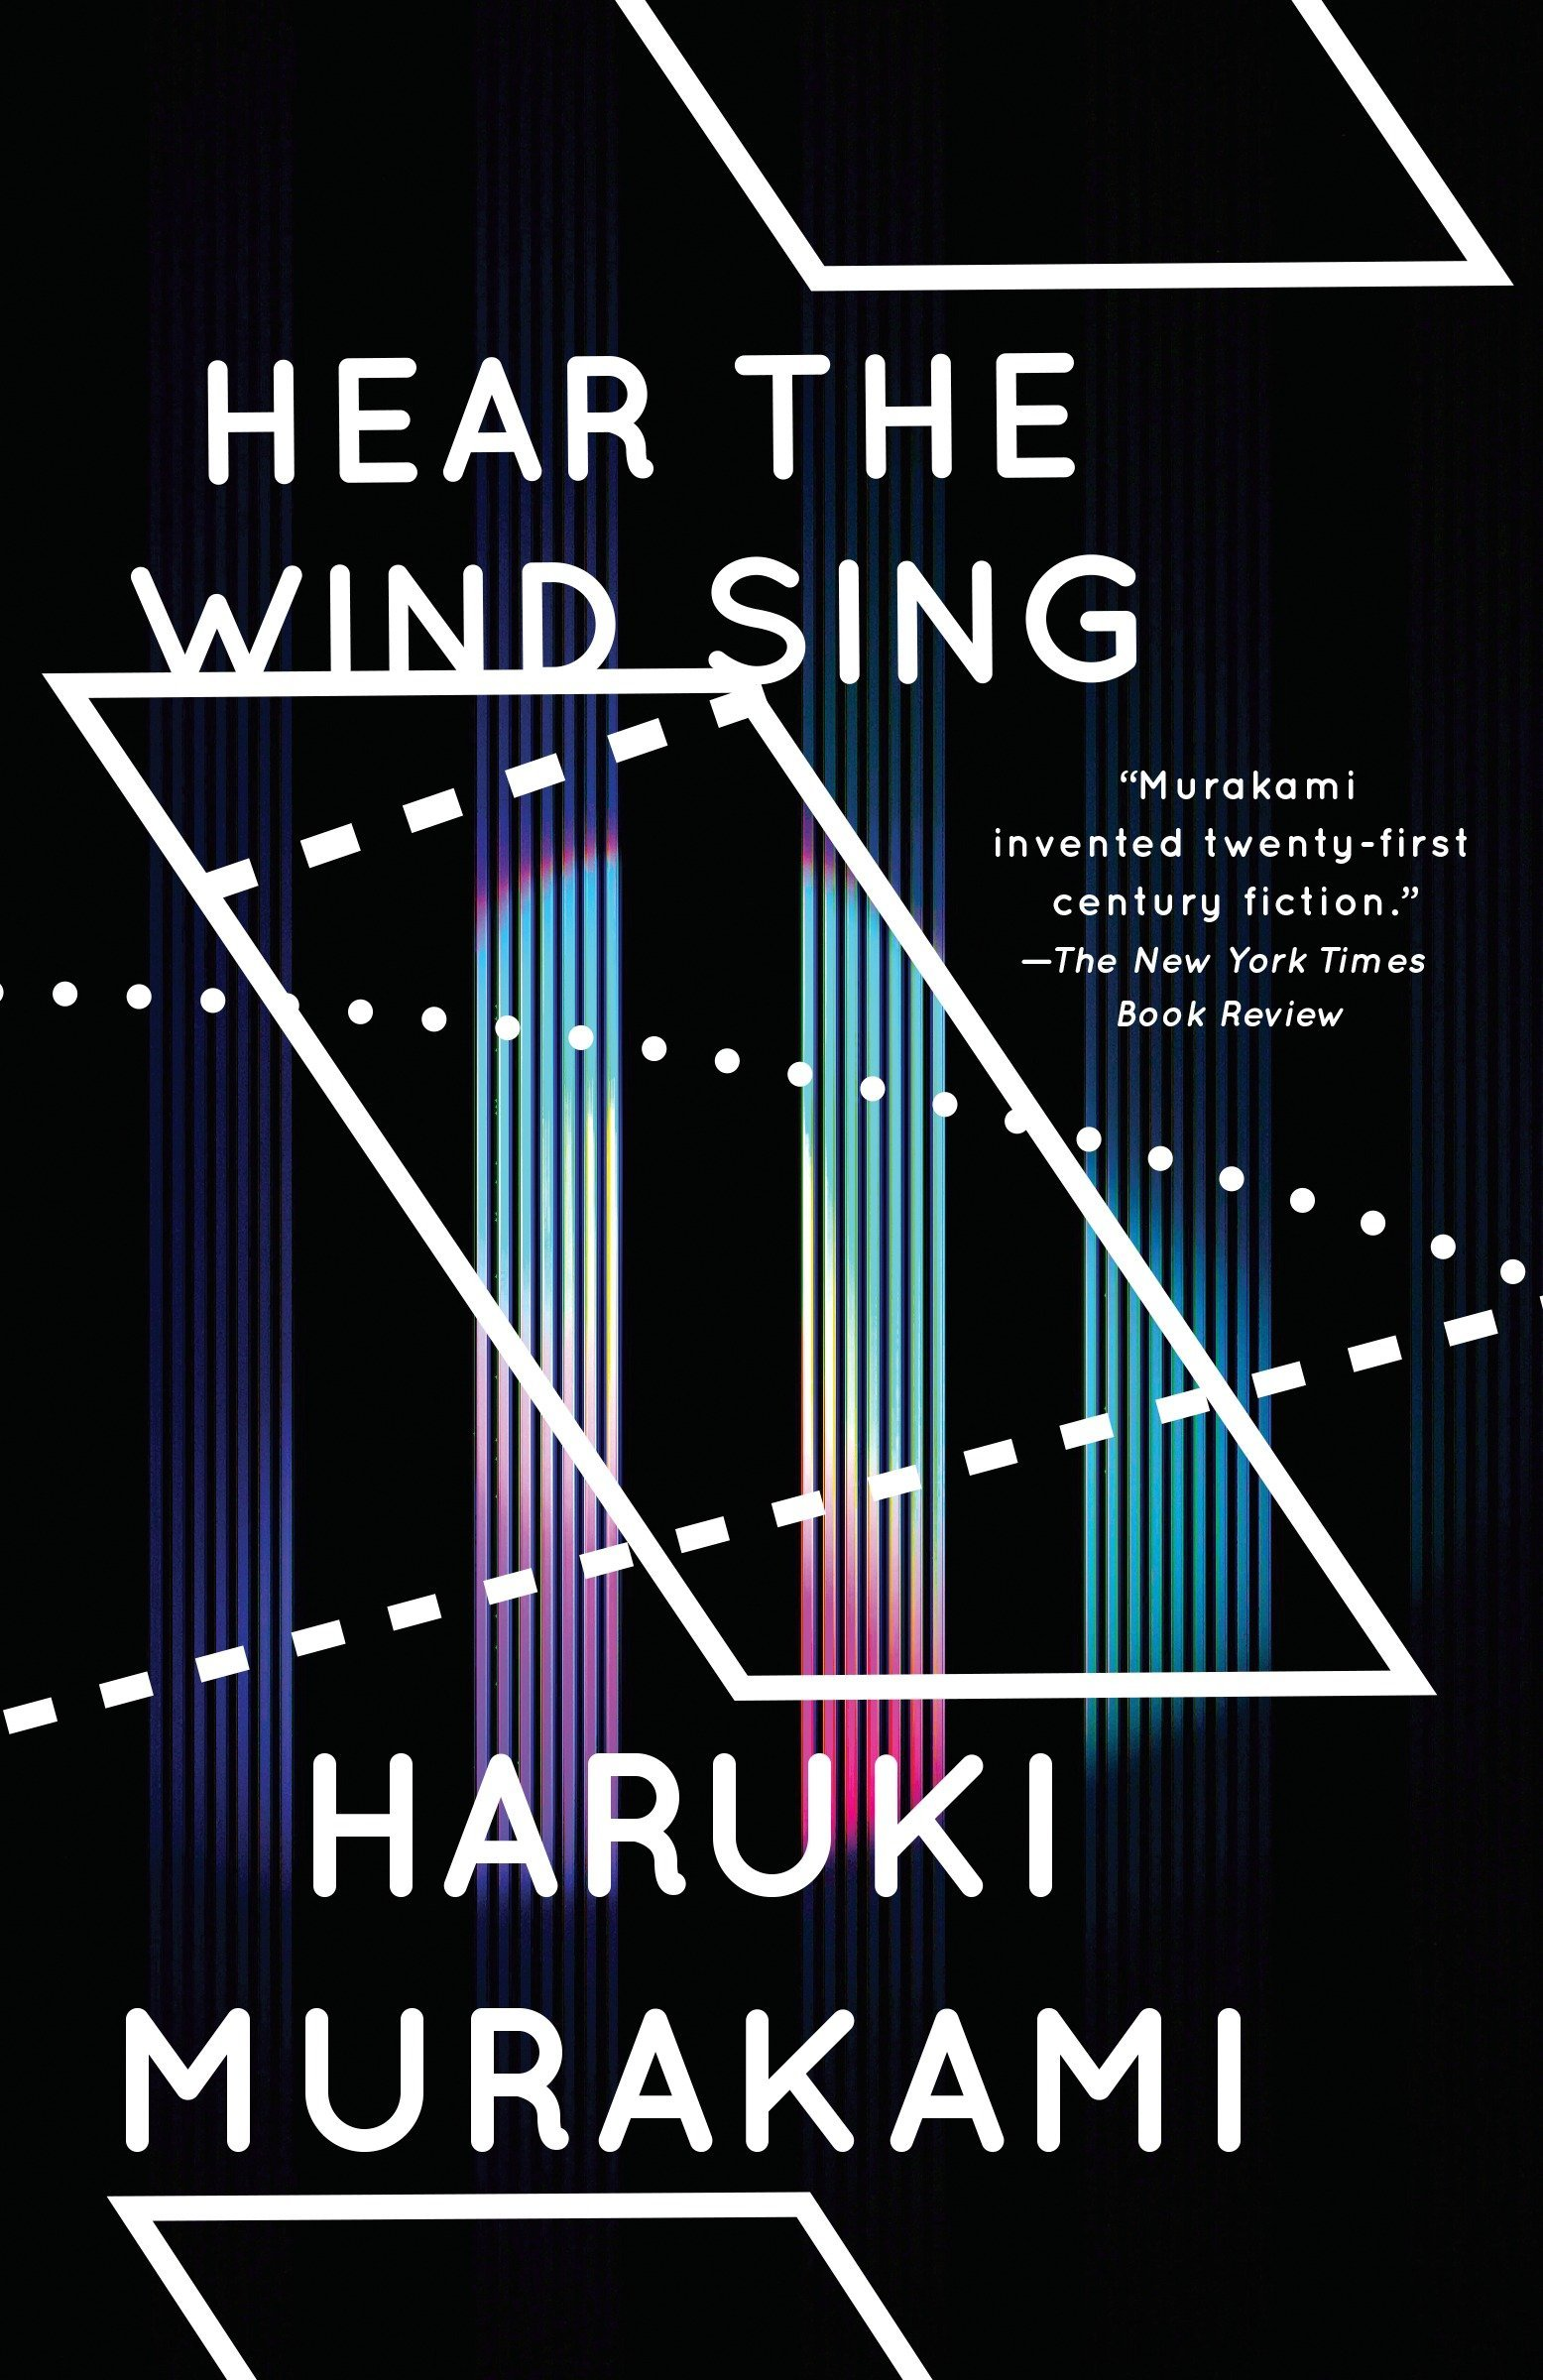 Wind/Pinball: Hear the Wind Sing and Pinball, 1973 (Two Novels) (Vintage  International): Murakami, Haruki, Goossen, Ted: 9780804170147: Amazon.com:  Books